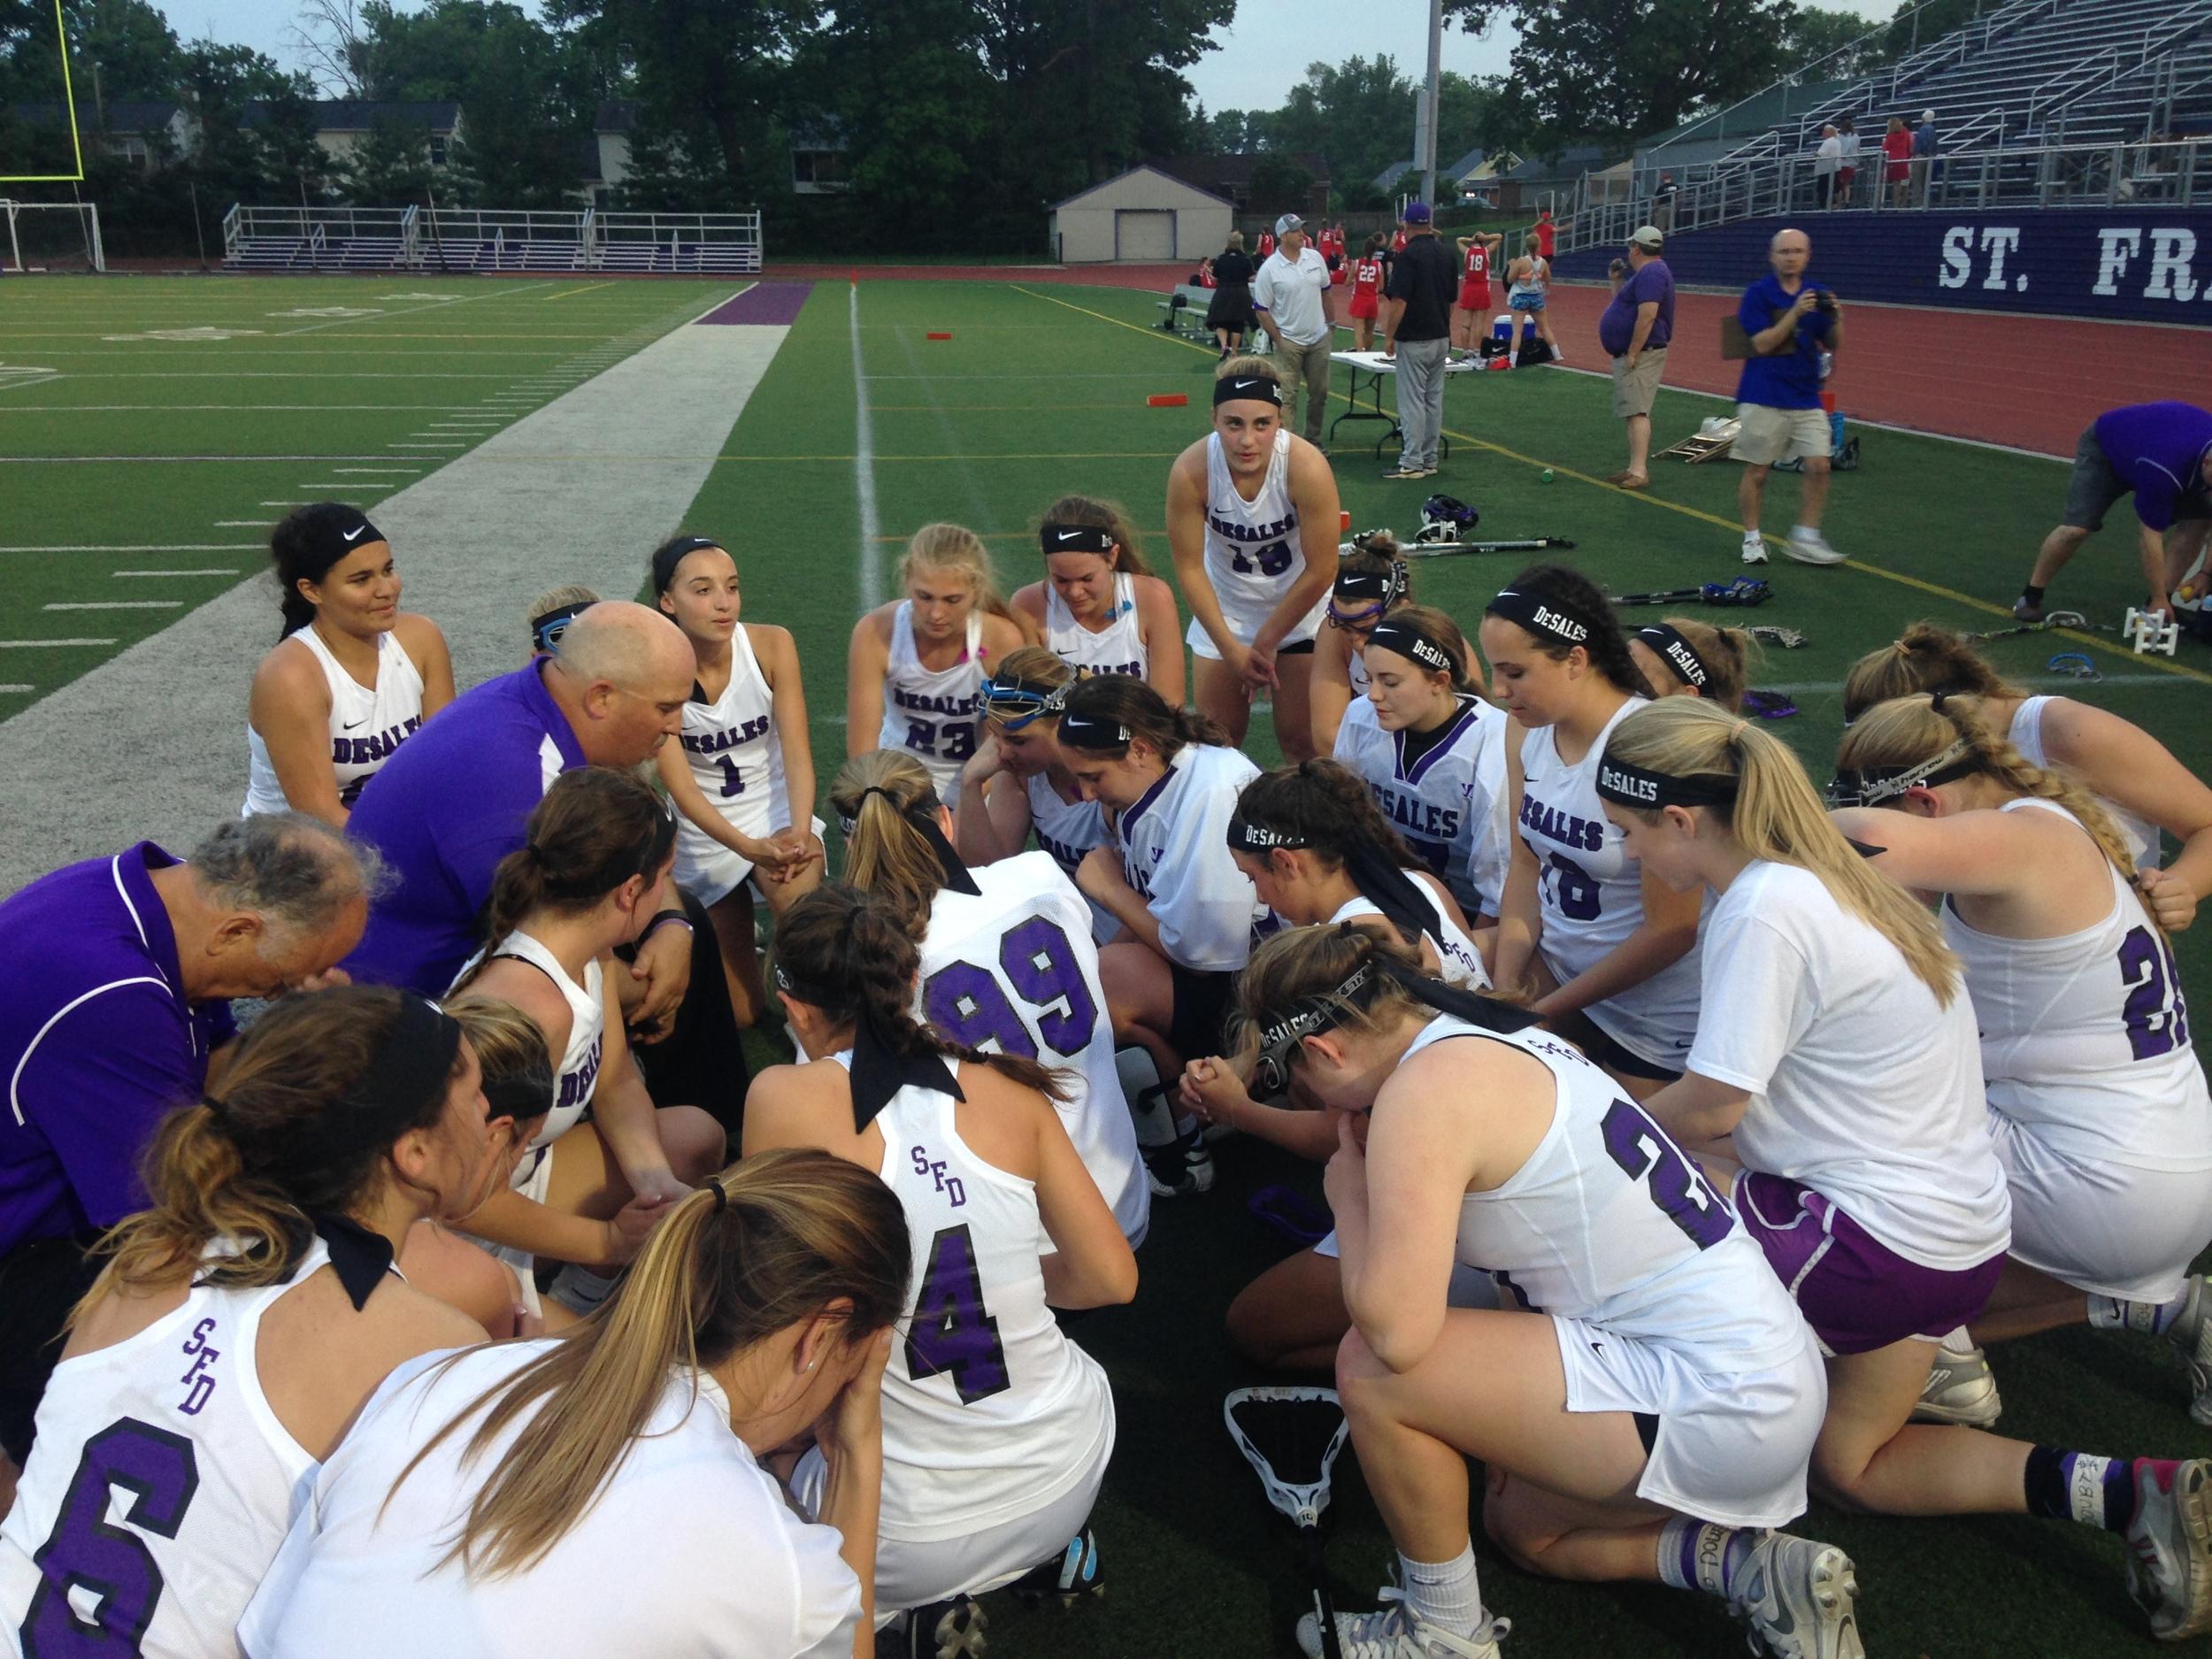 Postgame prayer after capturing the program's first Regional title